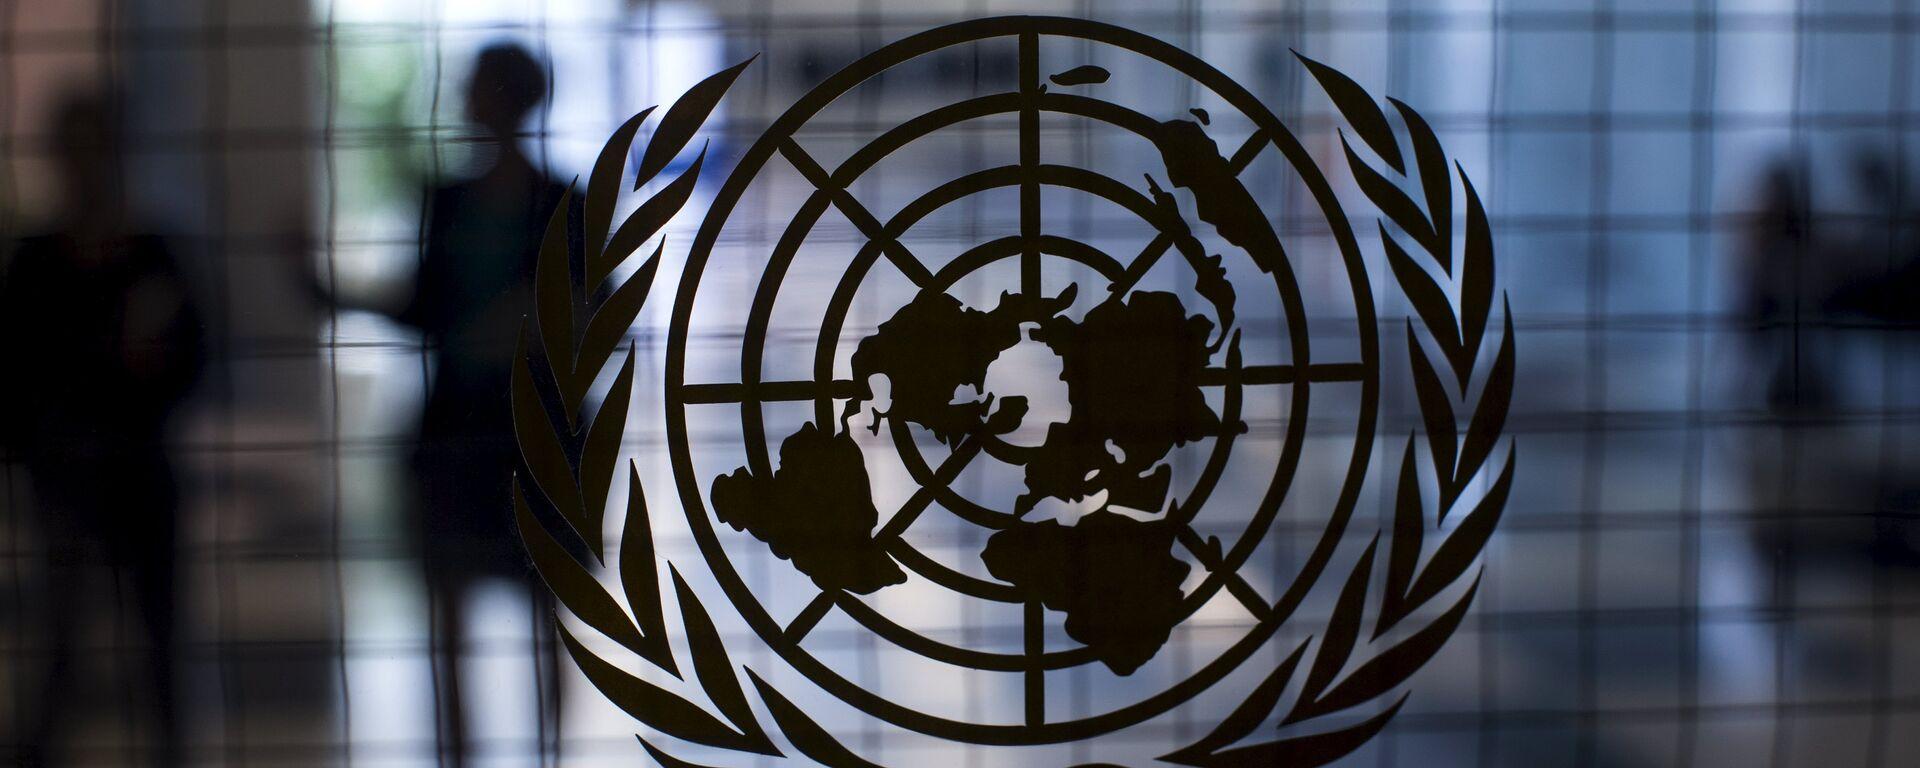 Logo de la ONU - Sputnik Mundo, 1920, 16.08.2021